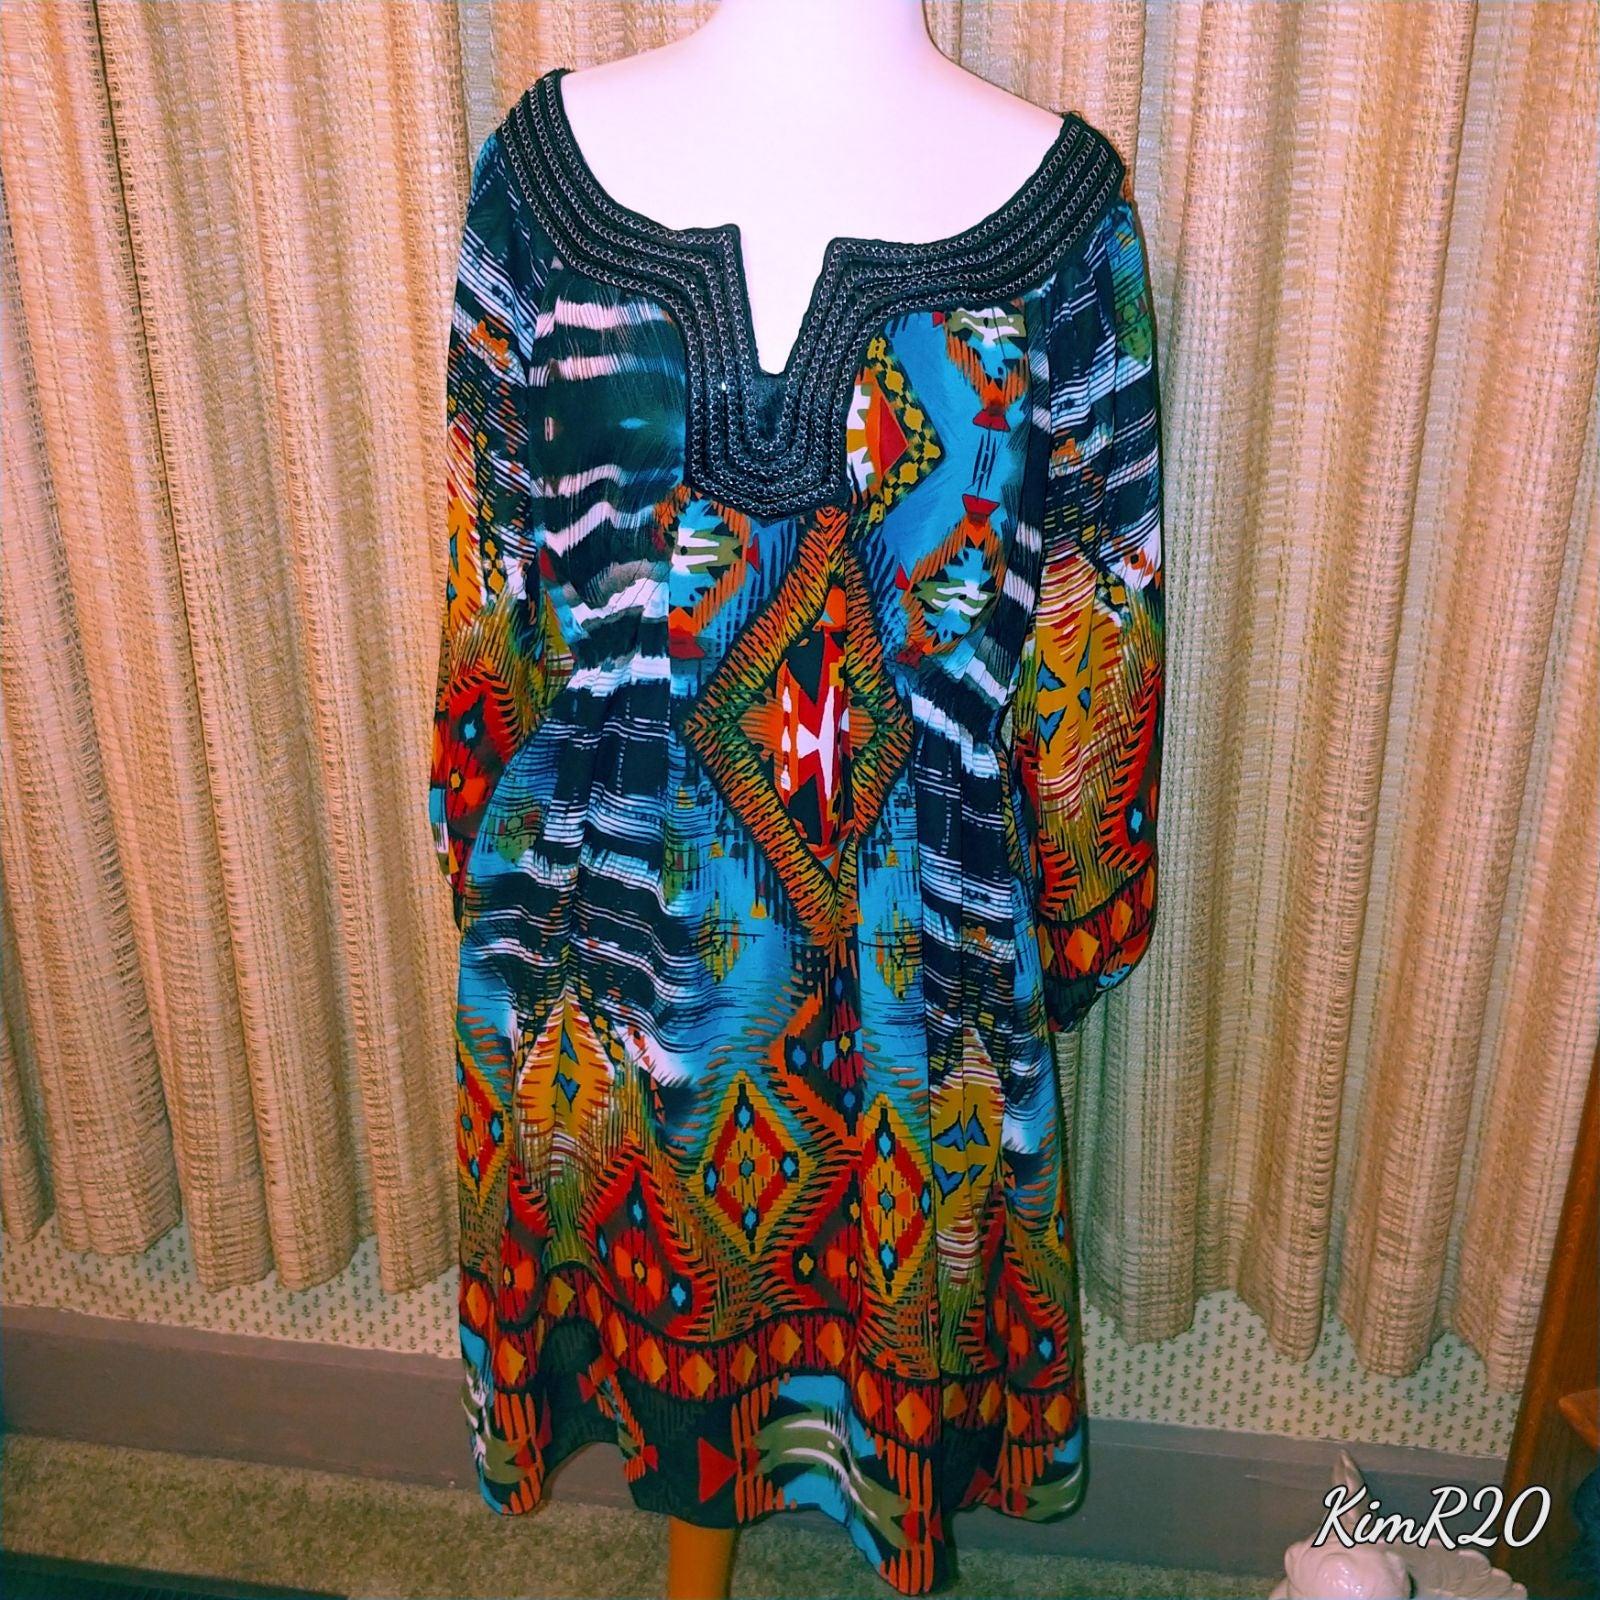 Dress Bohemian style by One World size L